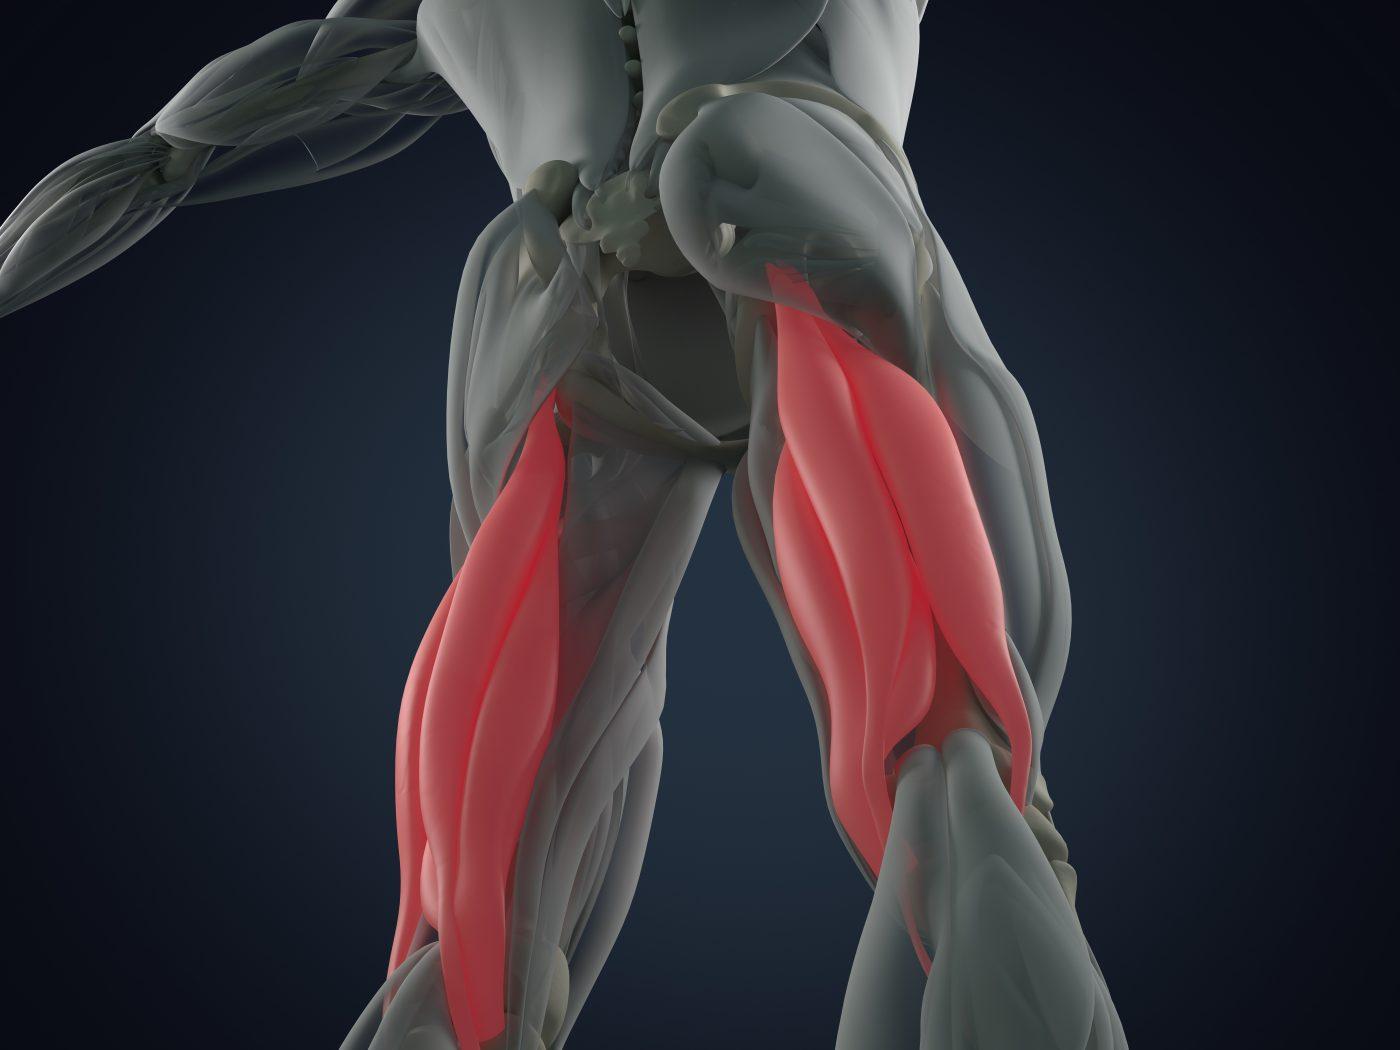 Hamstring injuries, sports physio belfast